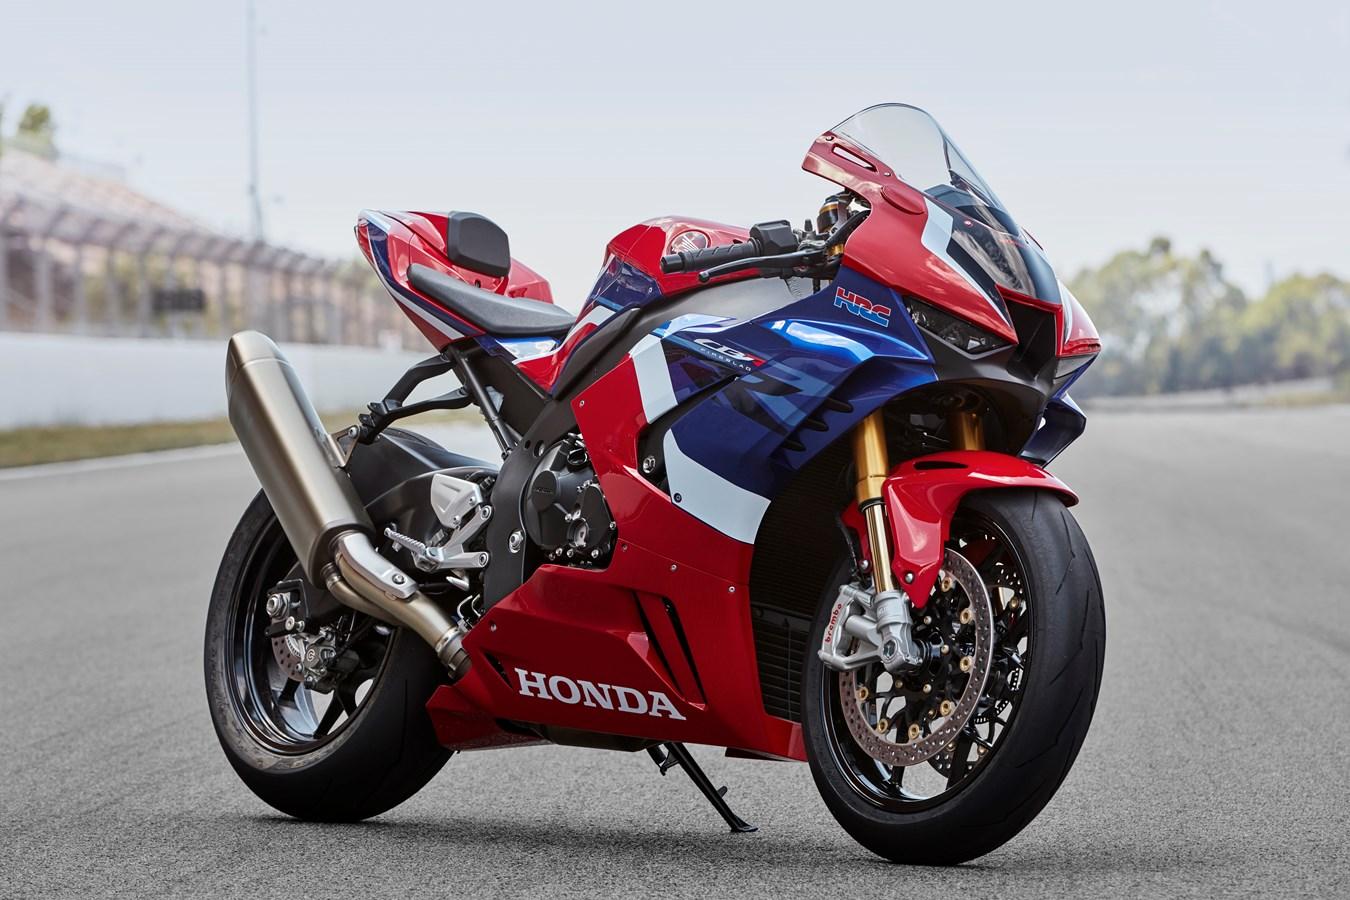 https://www.hondaprokevin.com/pictures/2021-cbr1000rr-r-sp/2021-honda-cbr1000rr-r-sp-fireblade-hrc-review-specs-changes-cbr-1000-rr-sport-bike-motorcycle-46.jpg